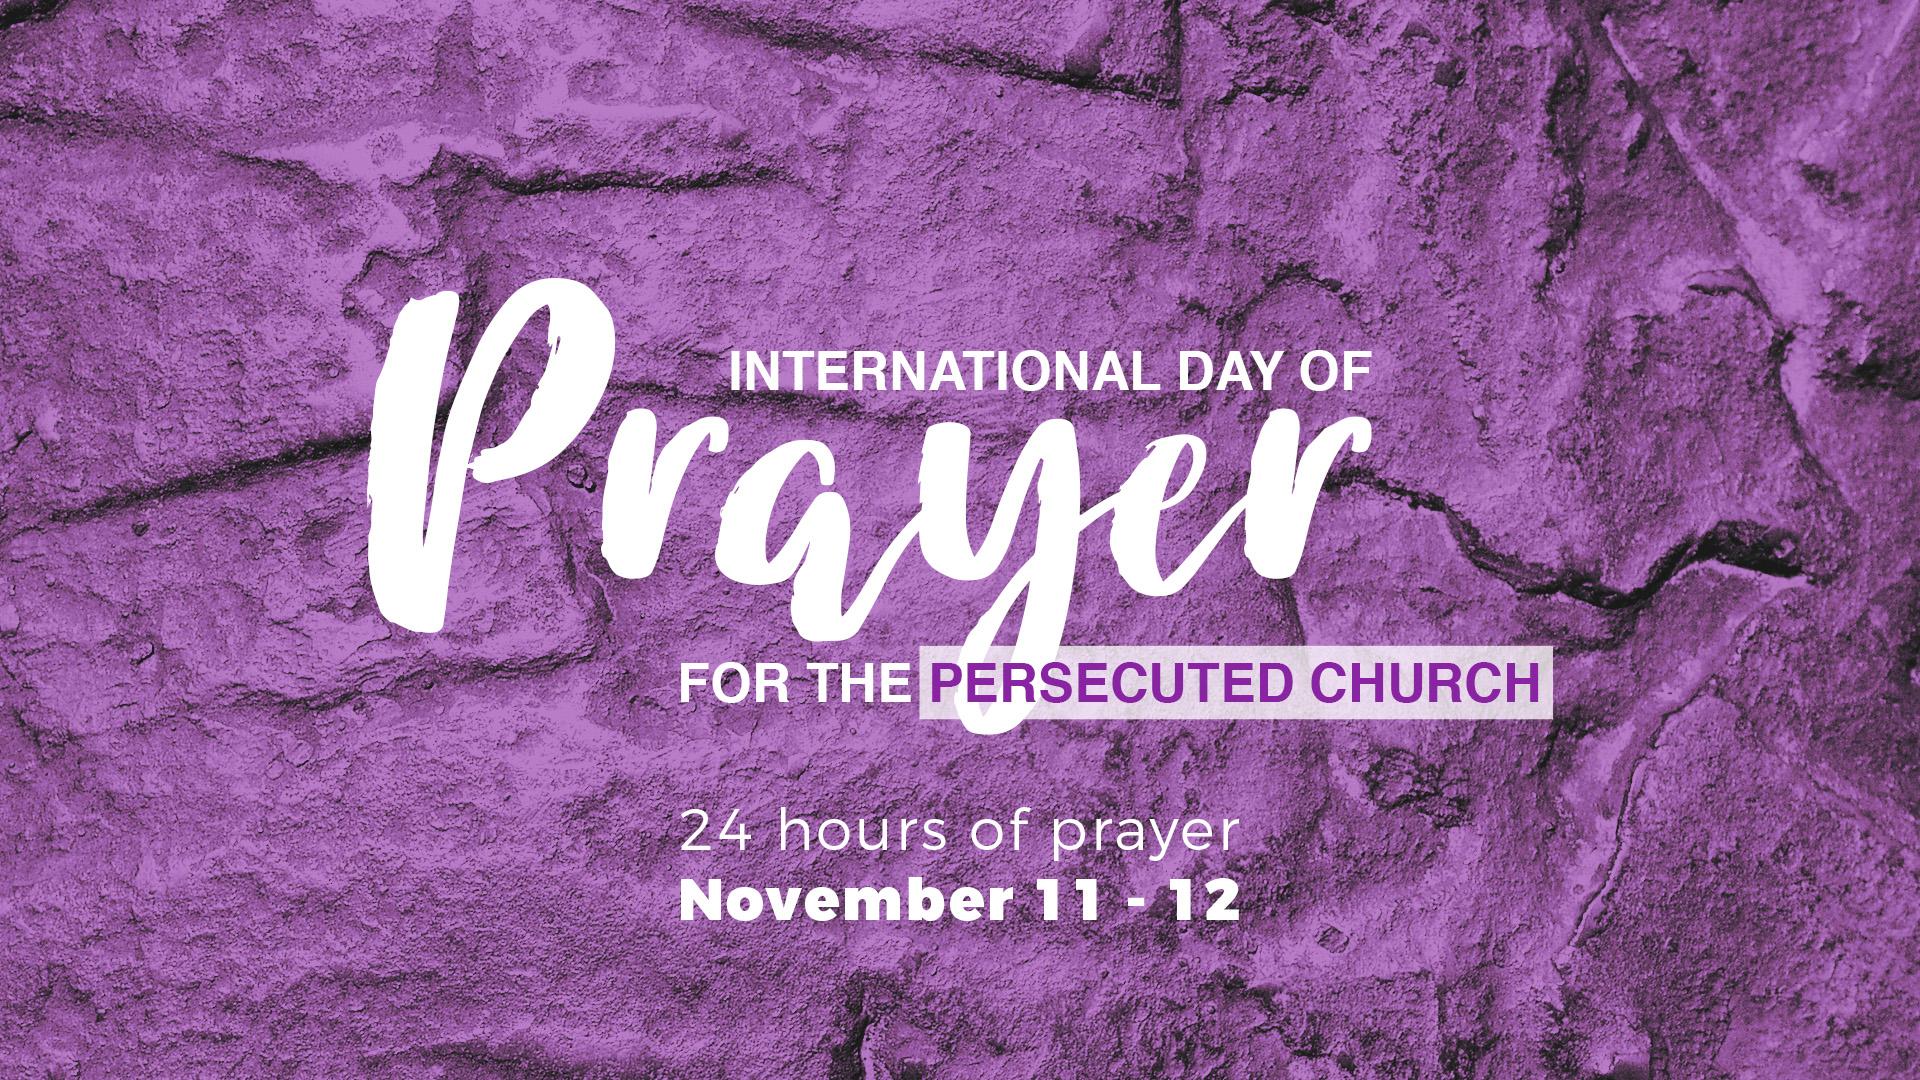 idoppc 24 hours of prayer dallas